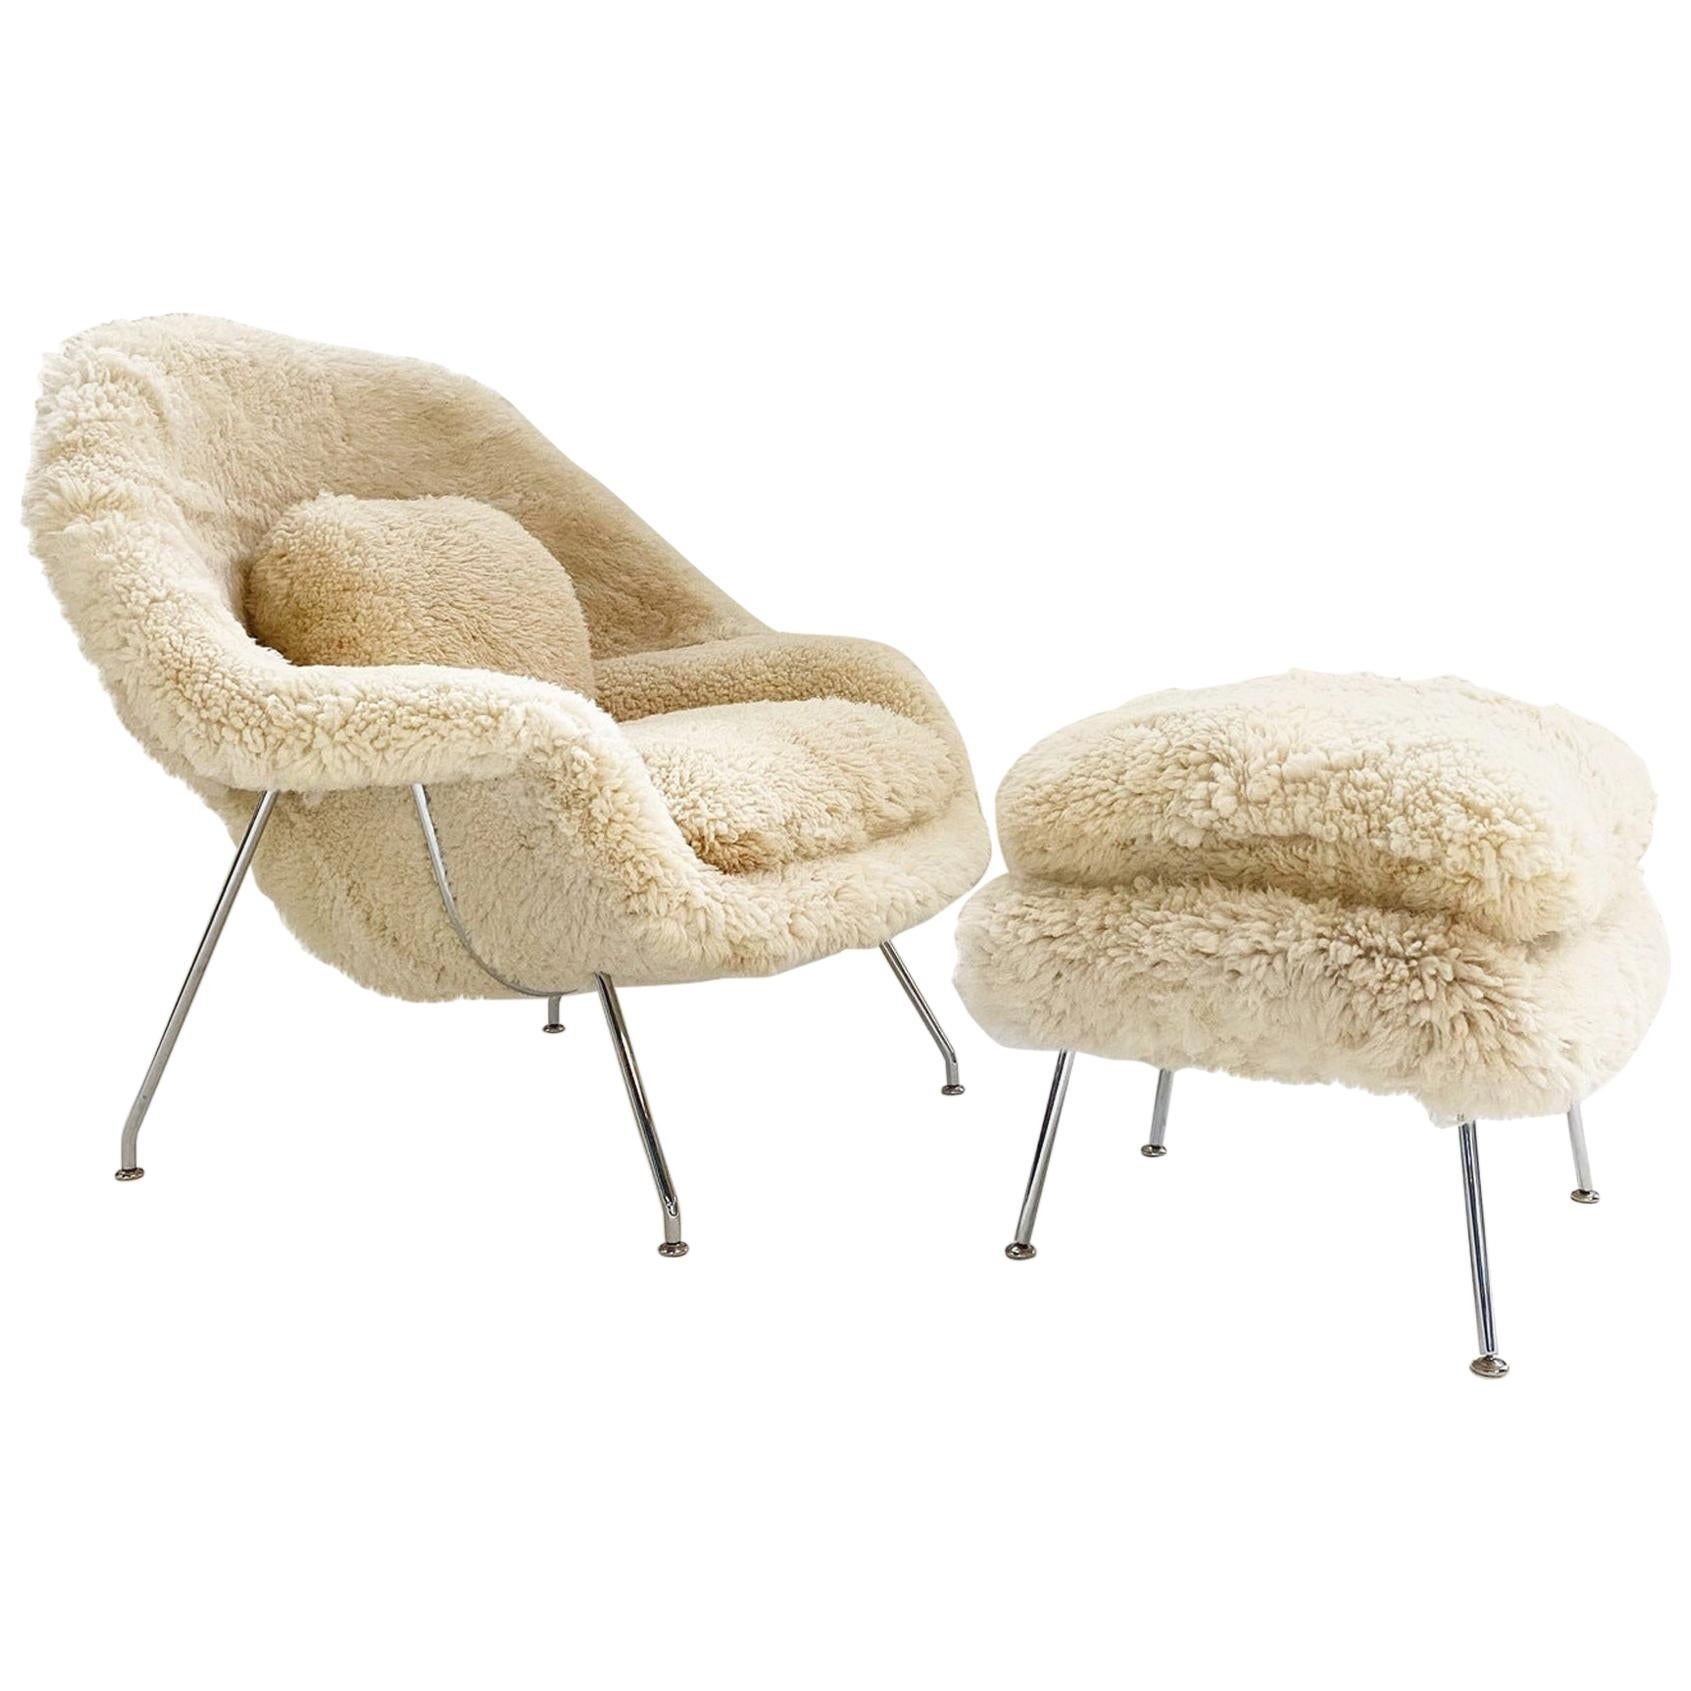 Bespoke Eero Saarinen Womb Chair and Ottoman in California Sheepskin